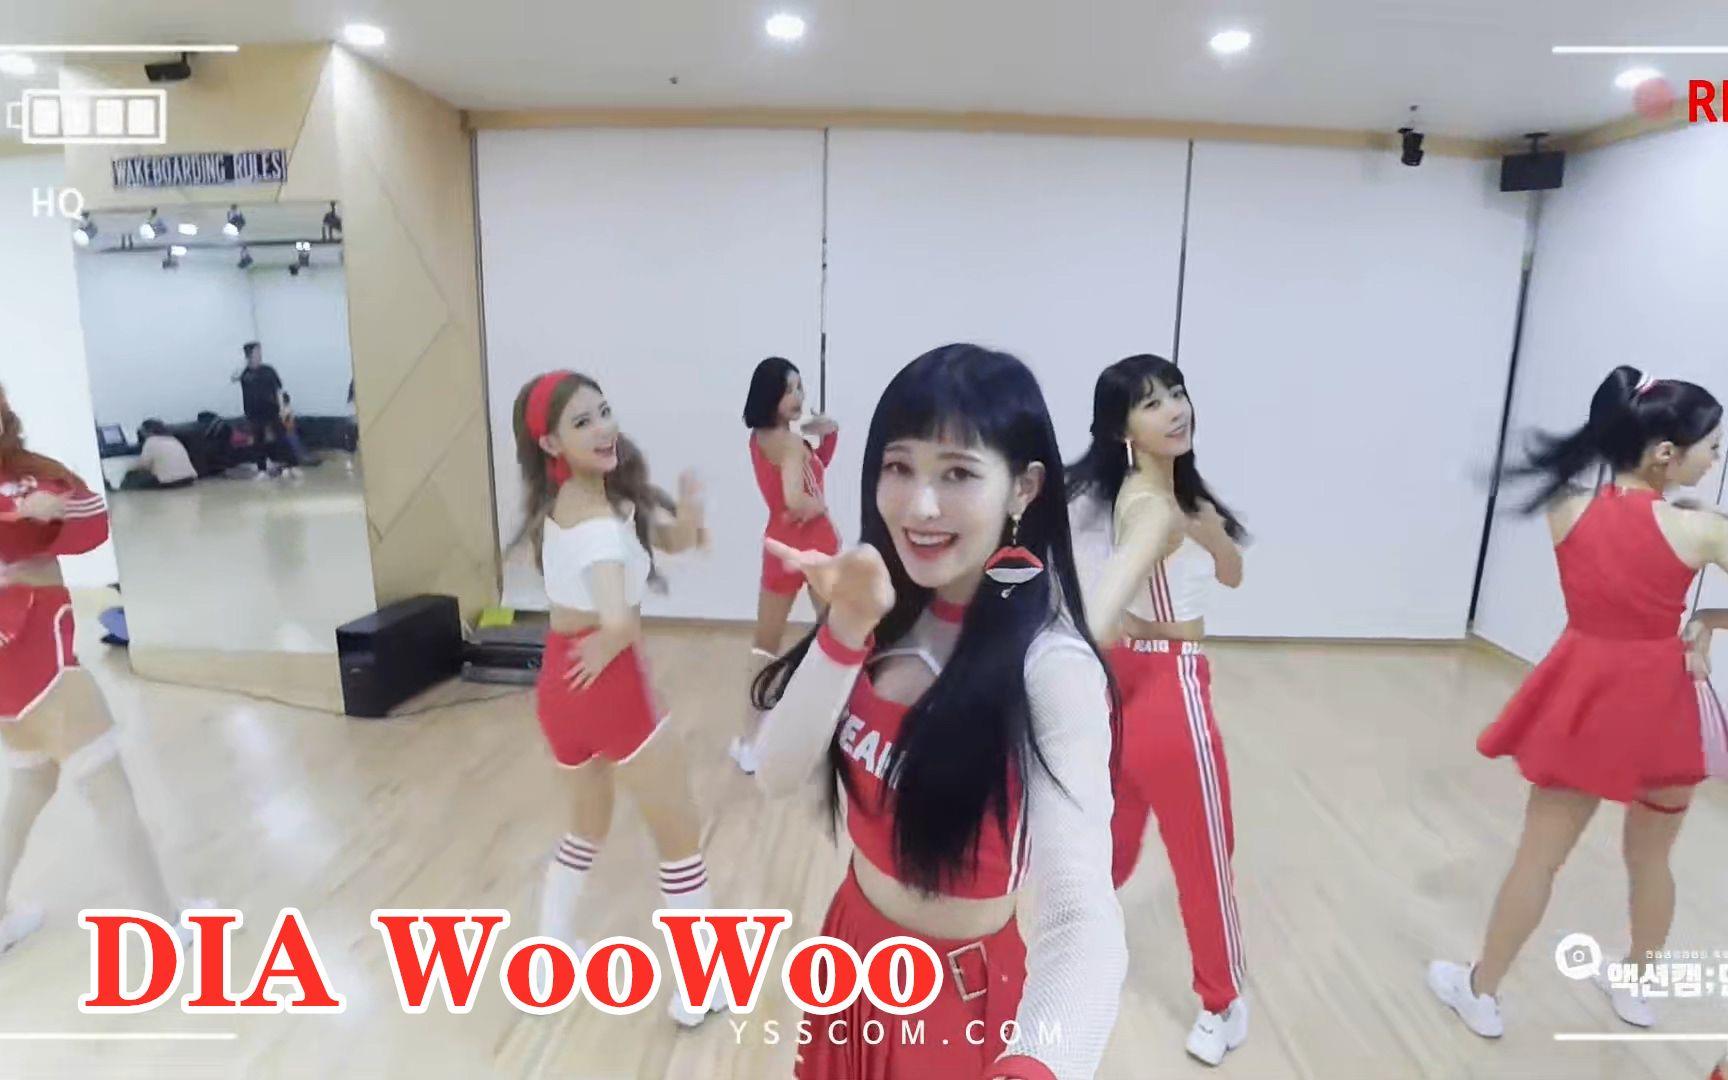 DIA 练习室自拍杆视角 Woo Woo